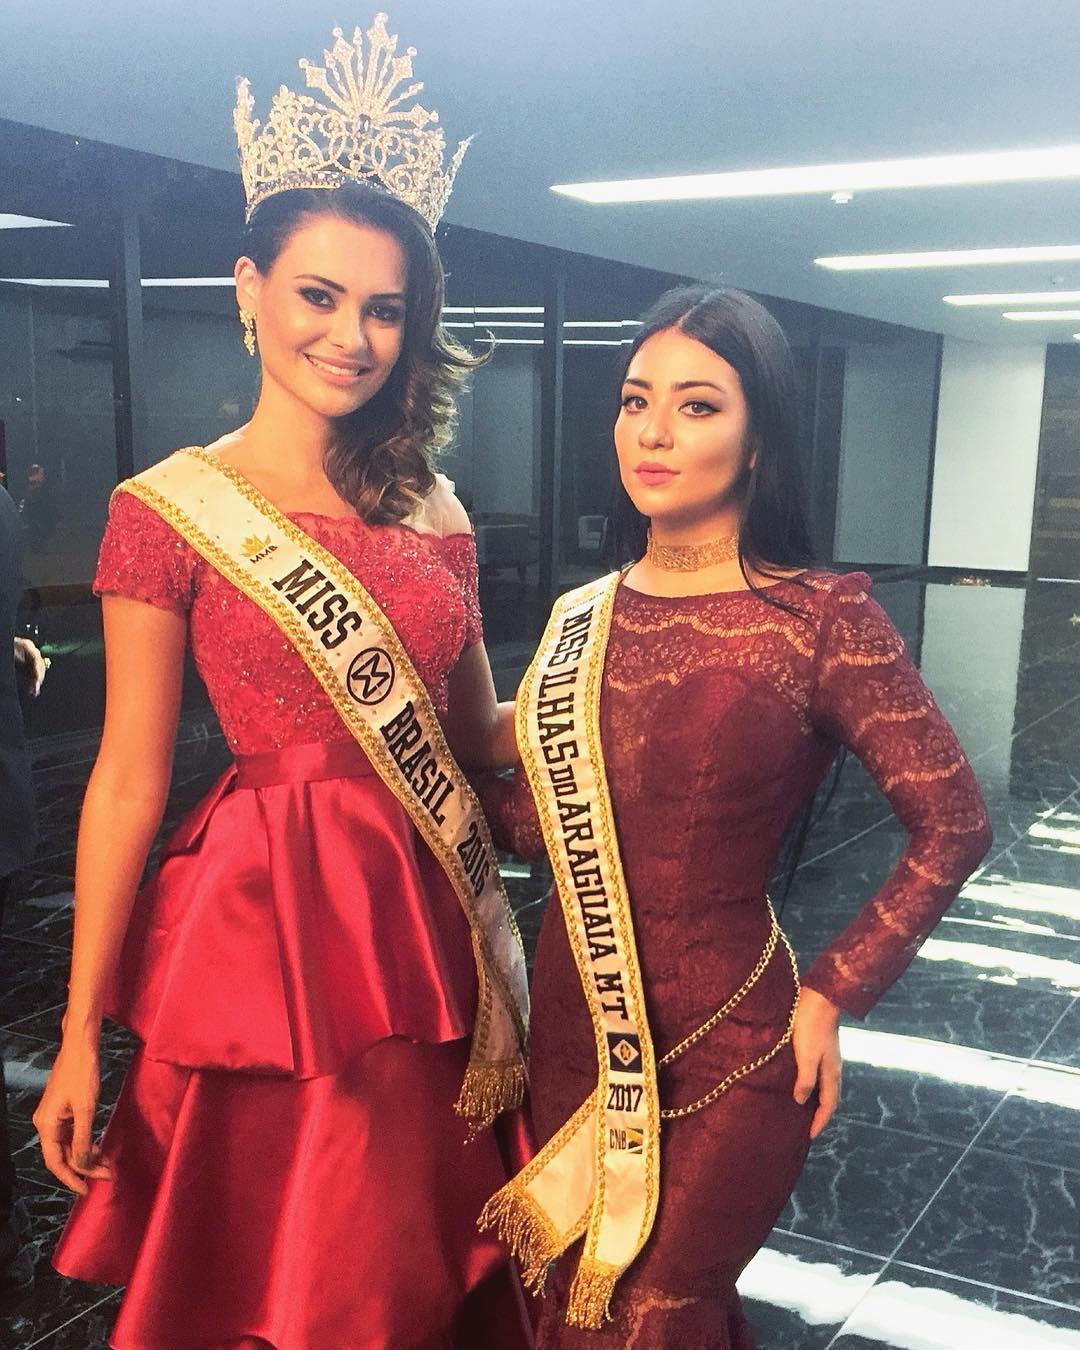 miss araguaia, ilhas (ilhas do araguaia) mundo 2017, quetlin heidrich. - Página 2 17663310